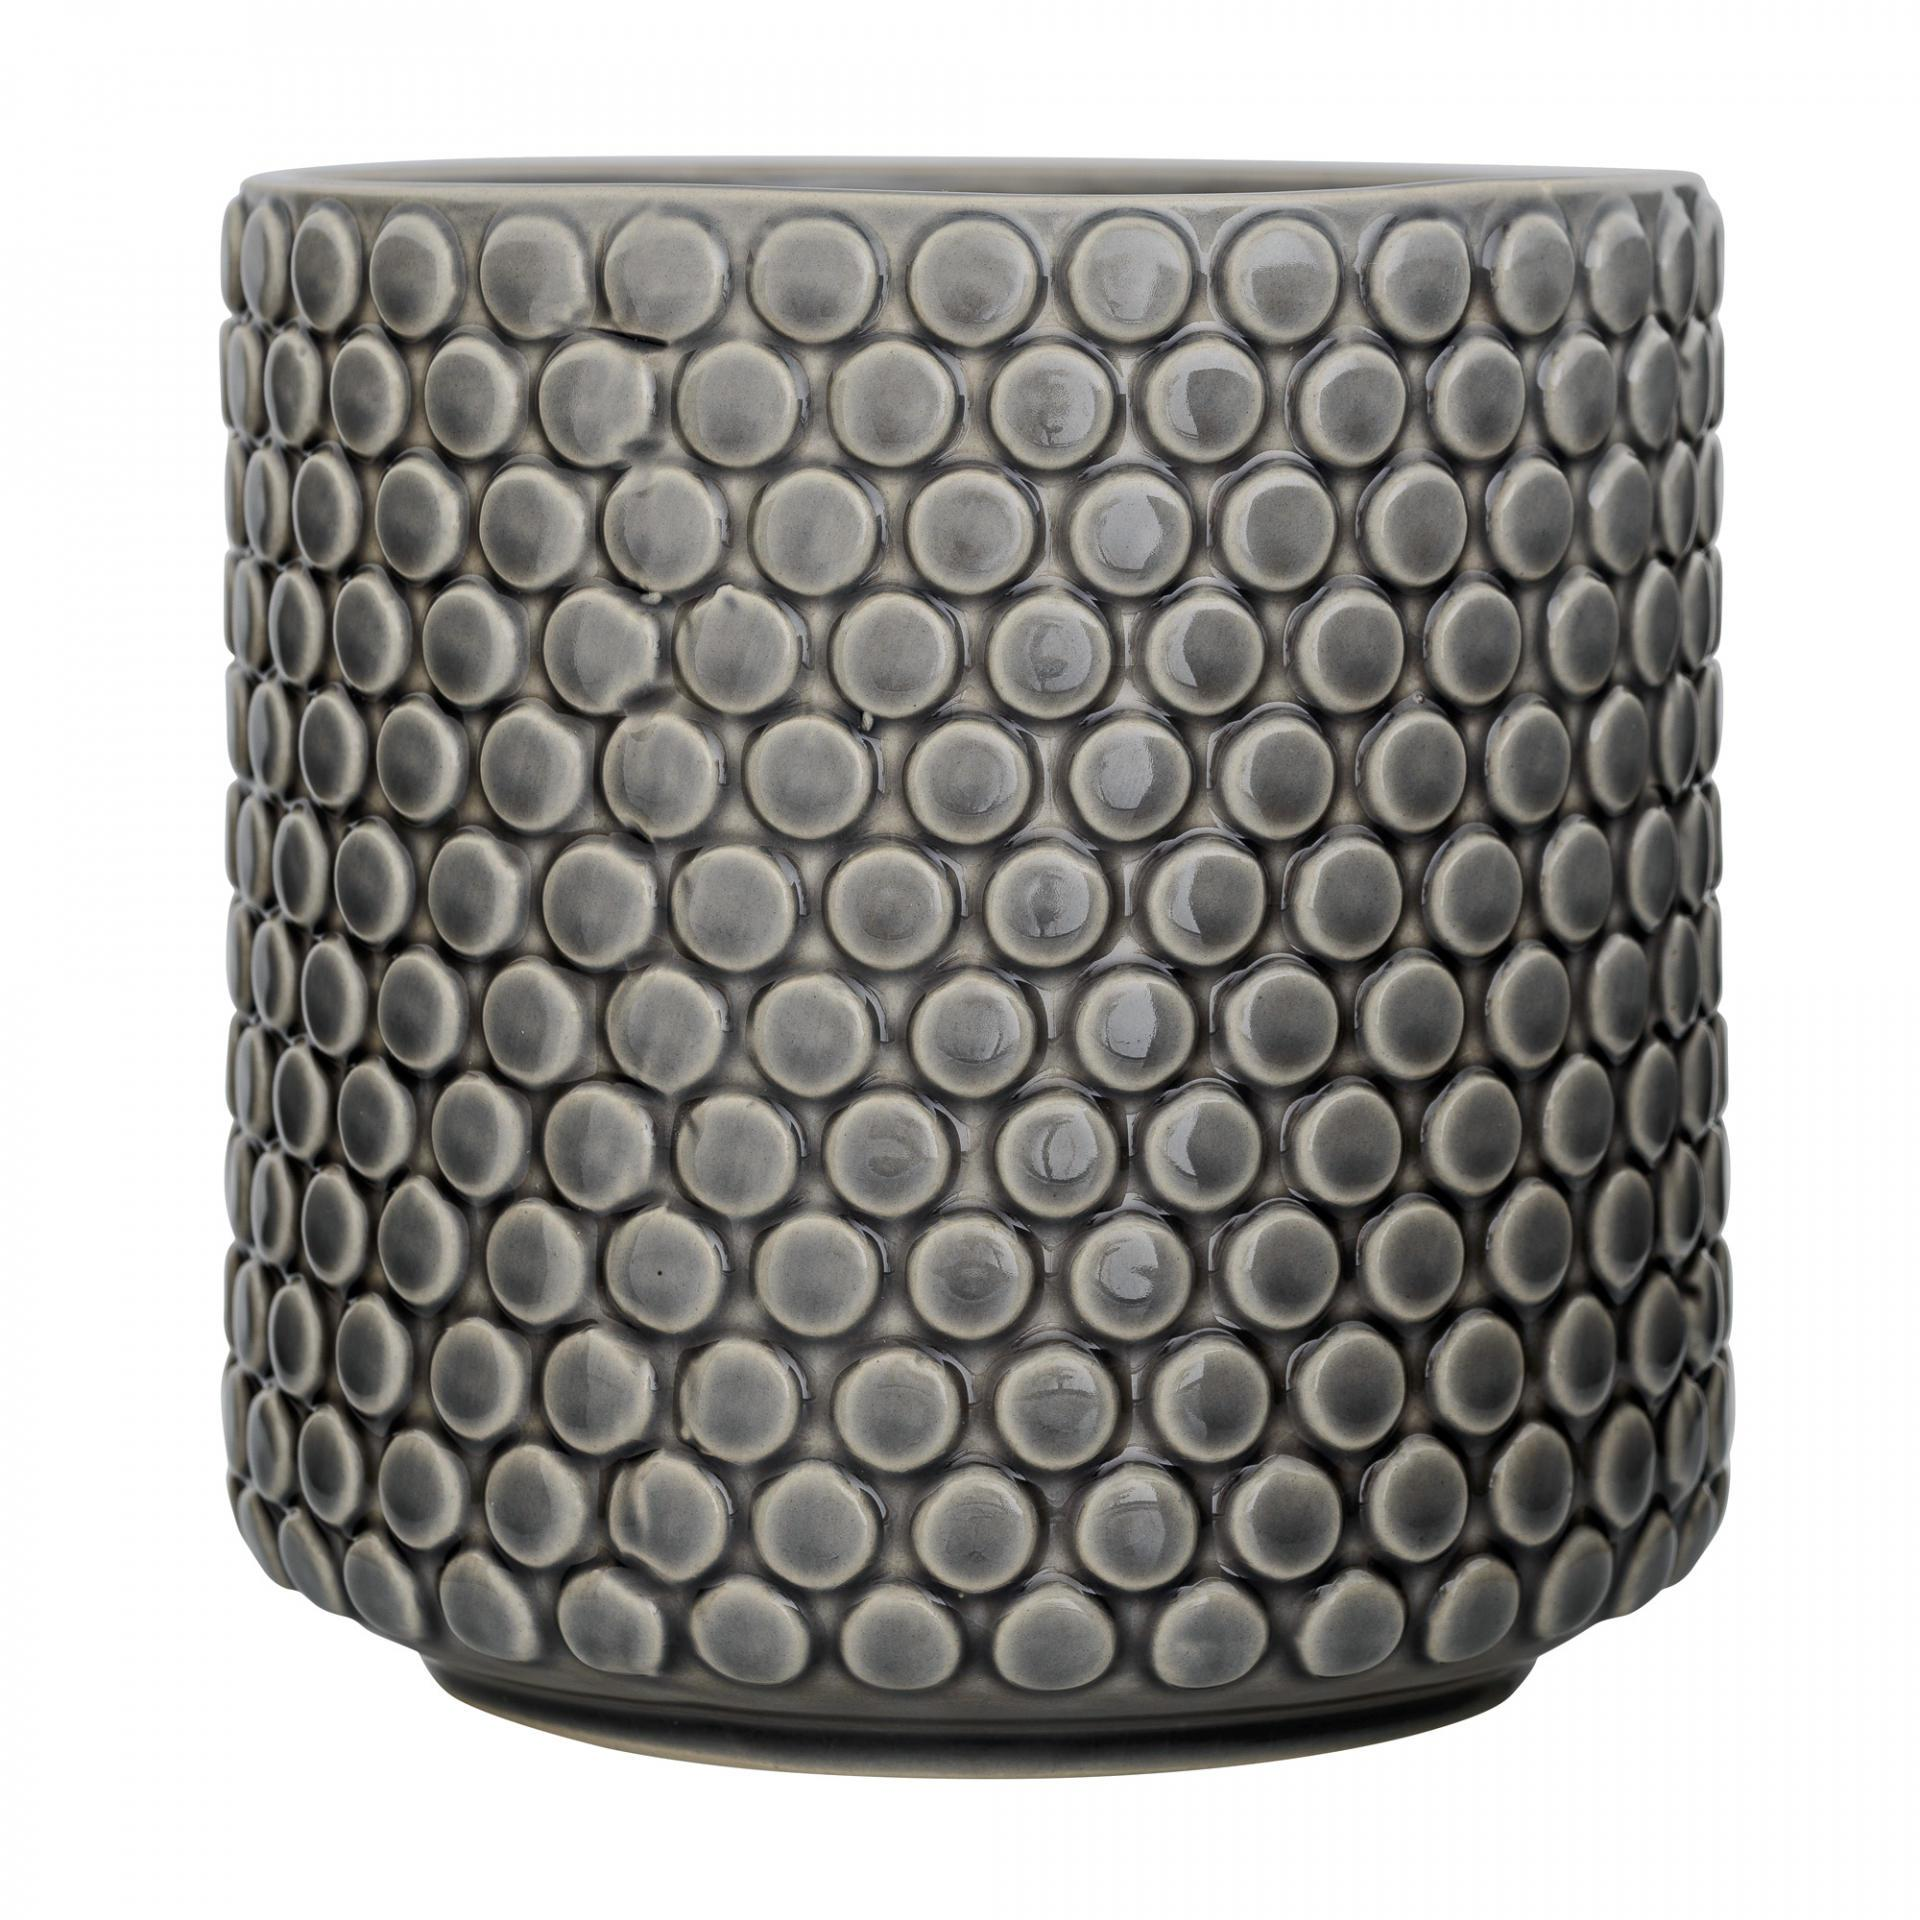 Bloomingville Keramický obal na květináč Grey, šedá barva, keramika